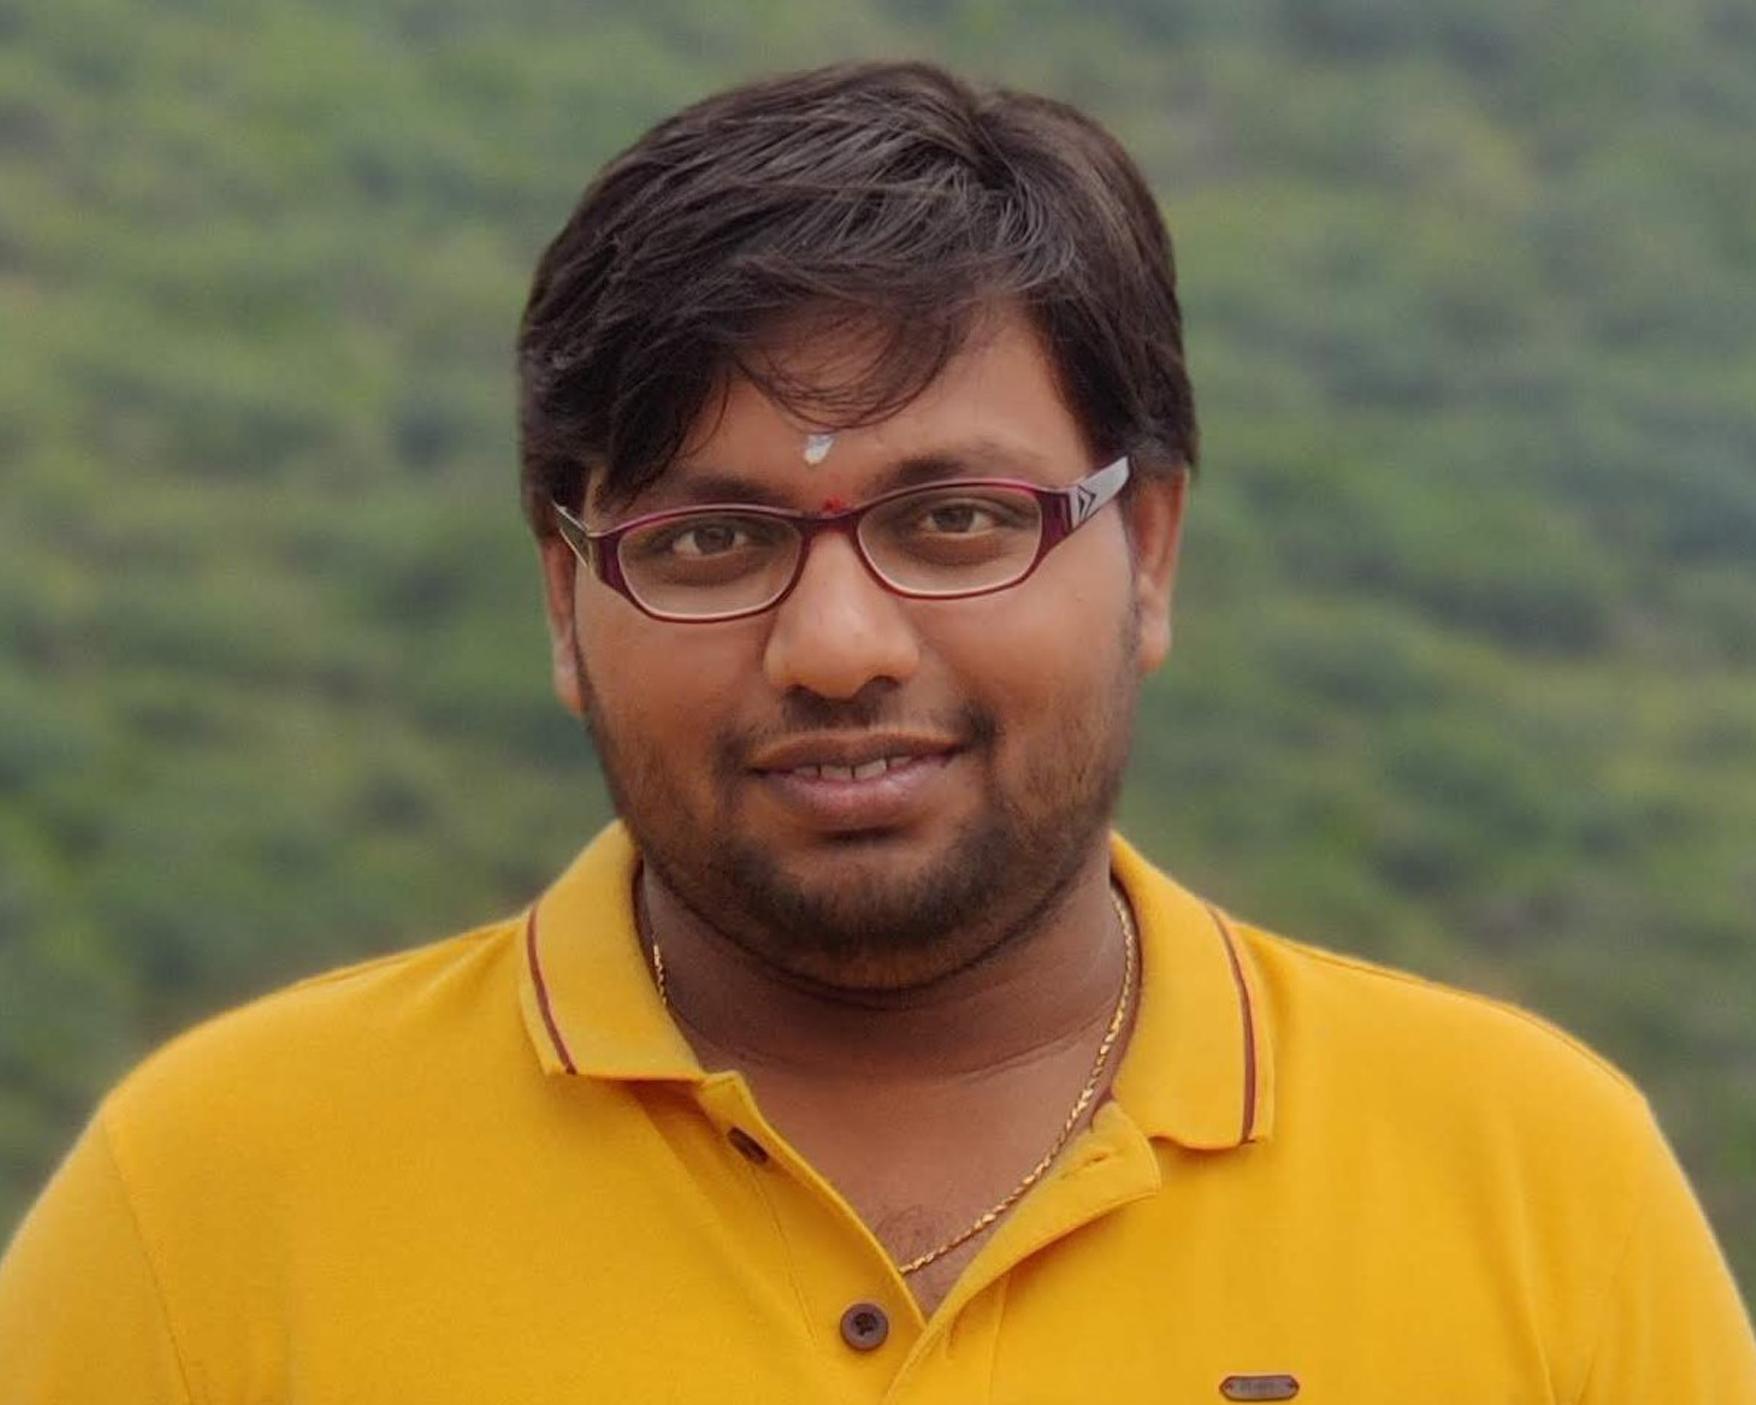 Chintalapudi Hanumantha Rao